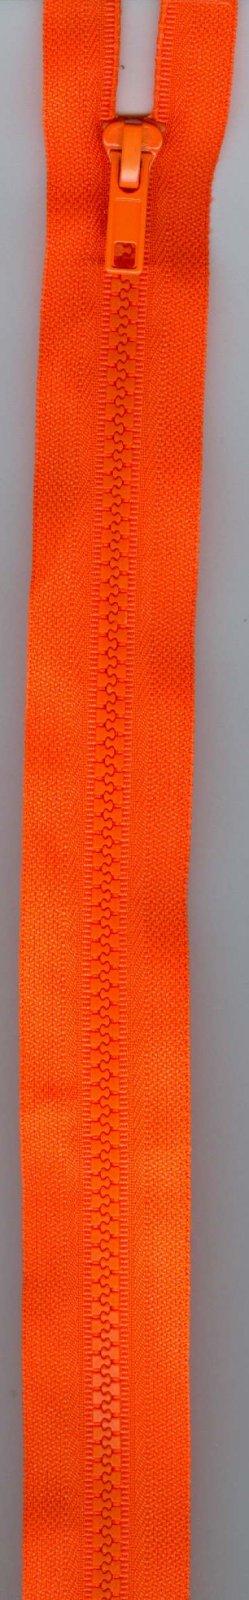 16 Separating Zipper #5 - Neon Orange